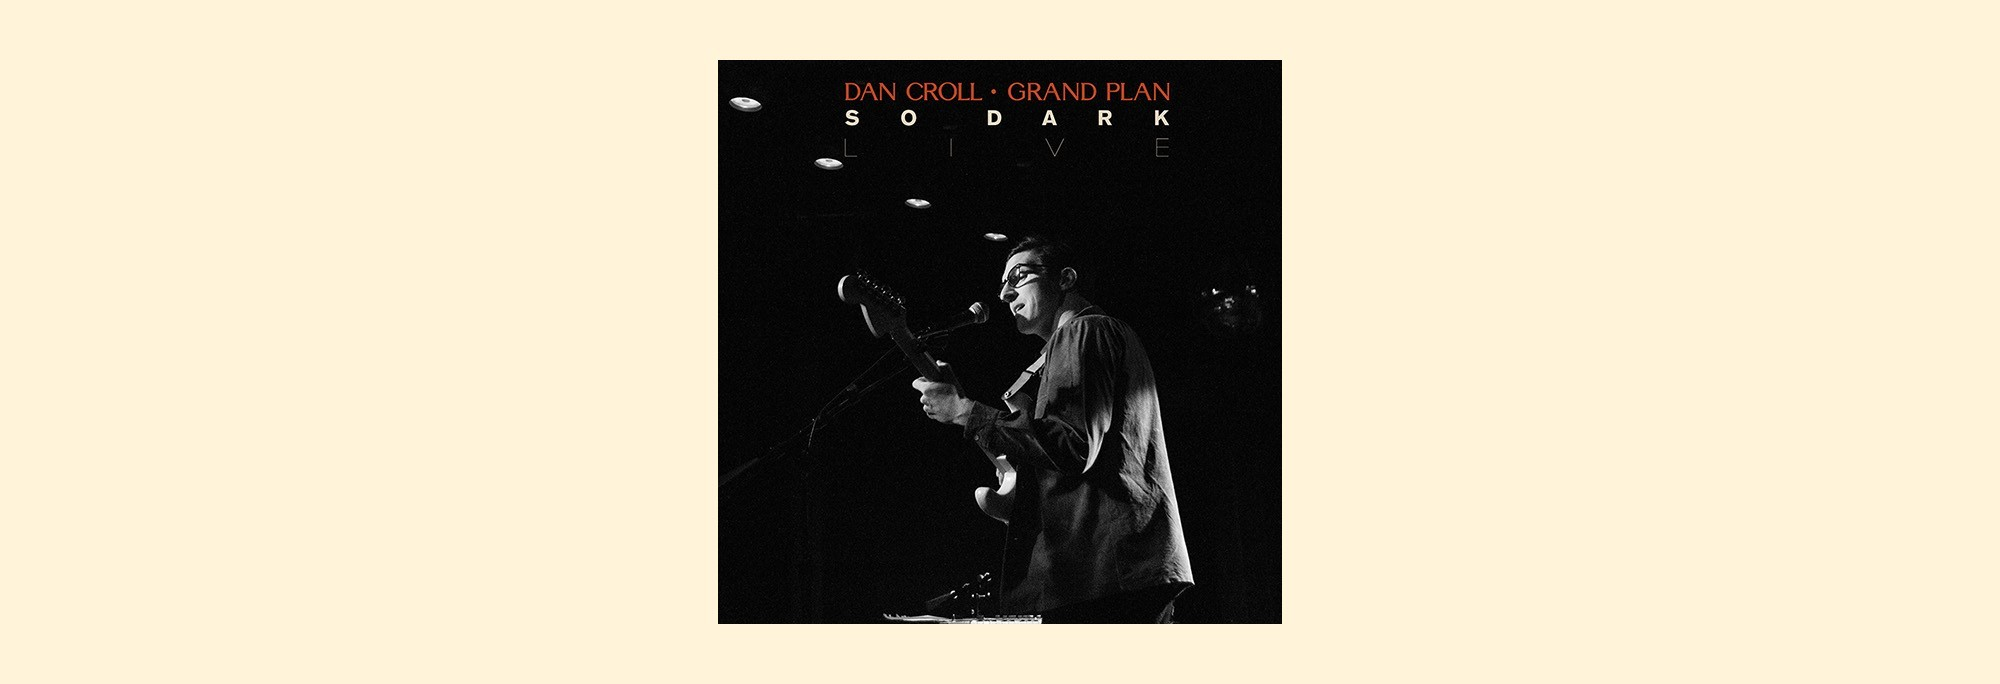 Dan Croll - So Dark (Live from Spacebomb)